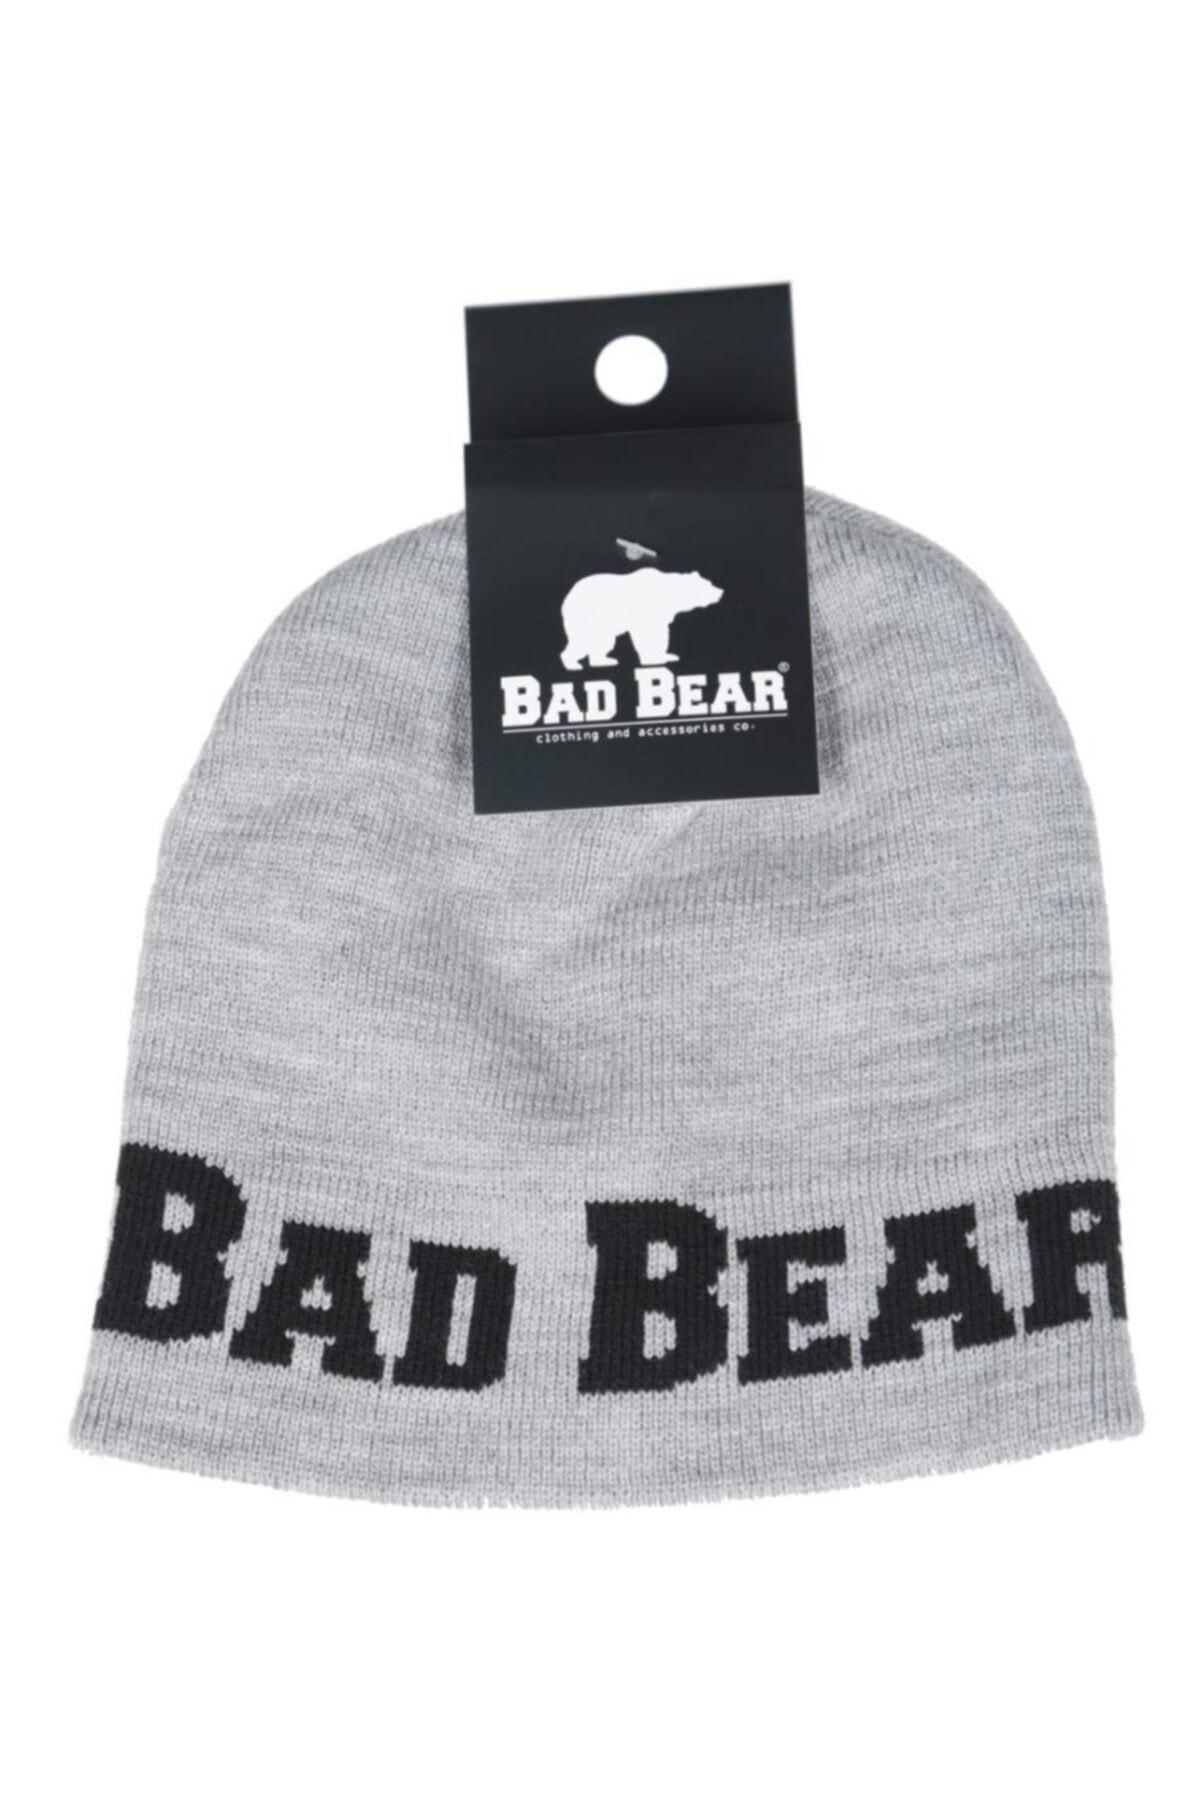 Bad Bear Erkek Bere 19.02.41.010 1